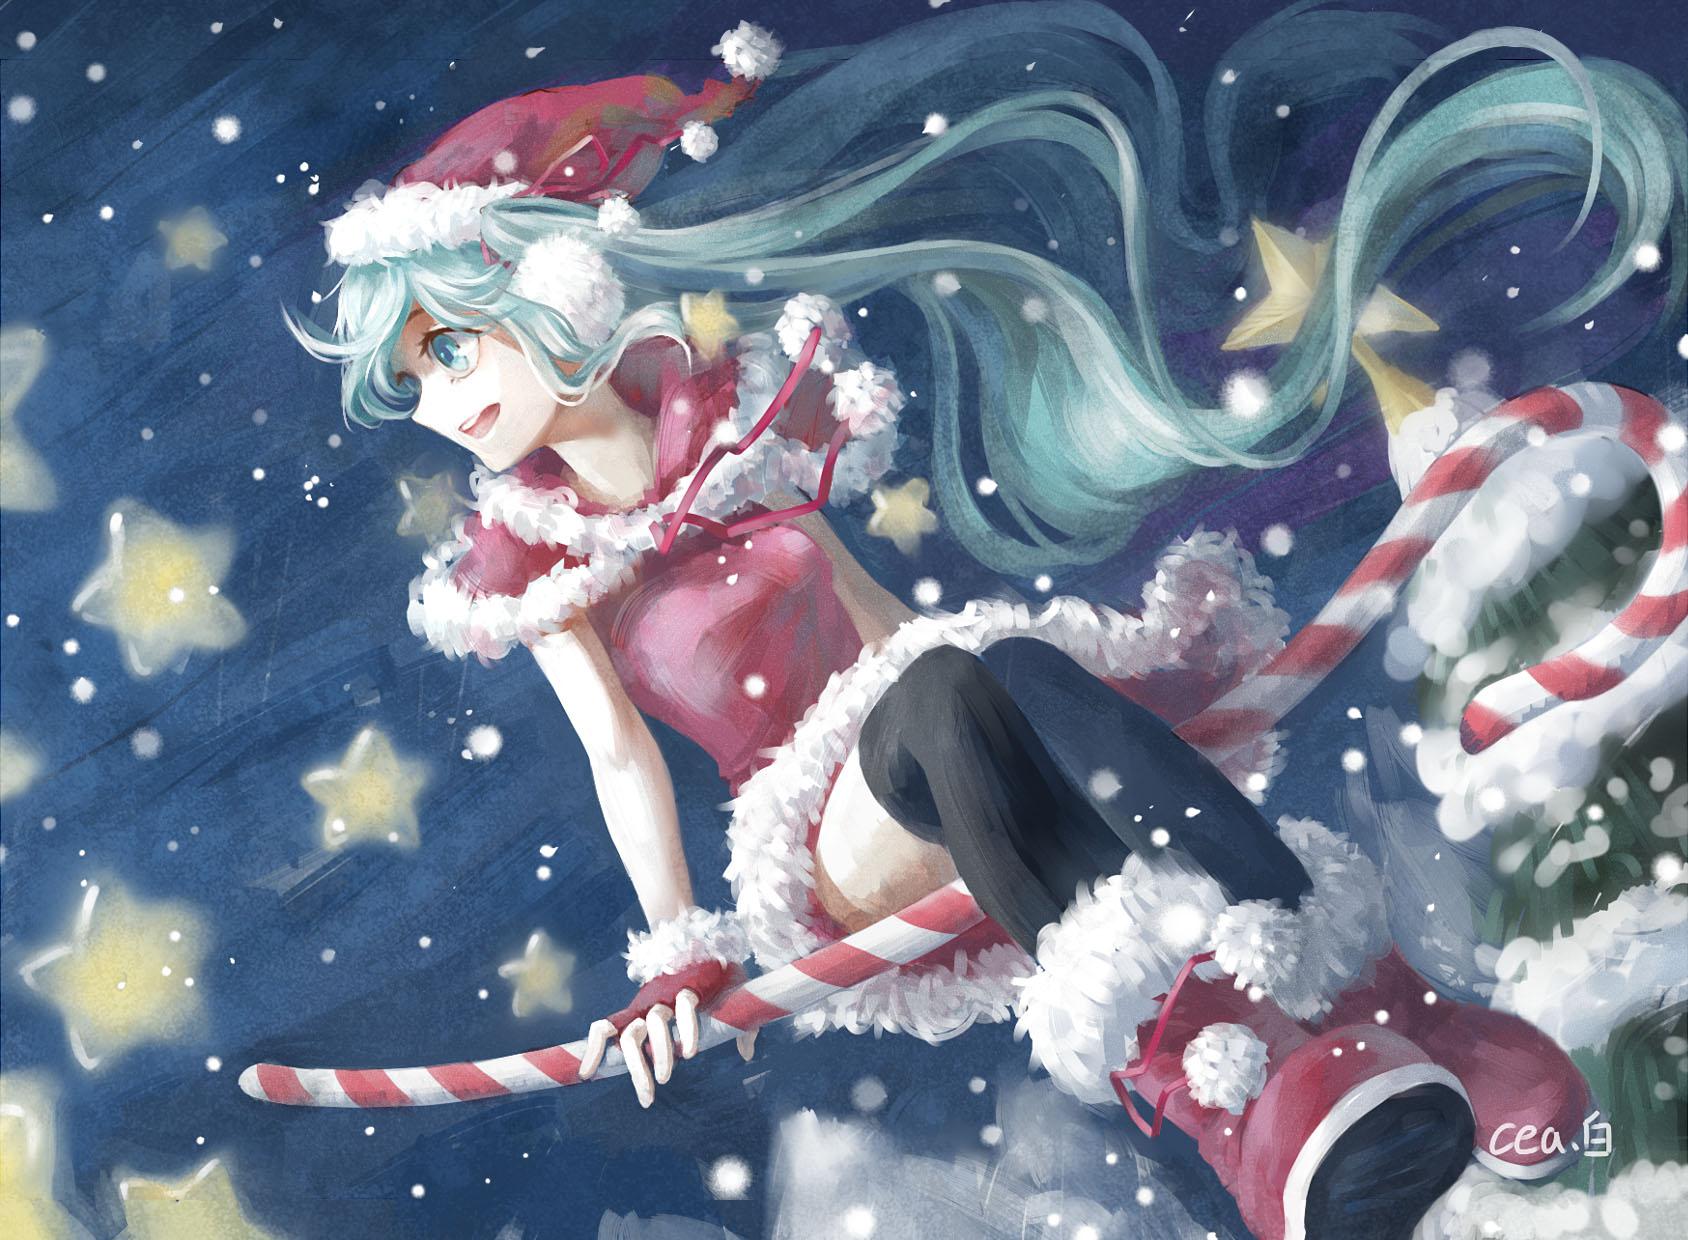 hatsune miku christmas wallpaper - photo #2